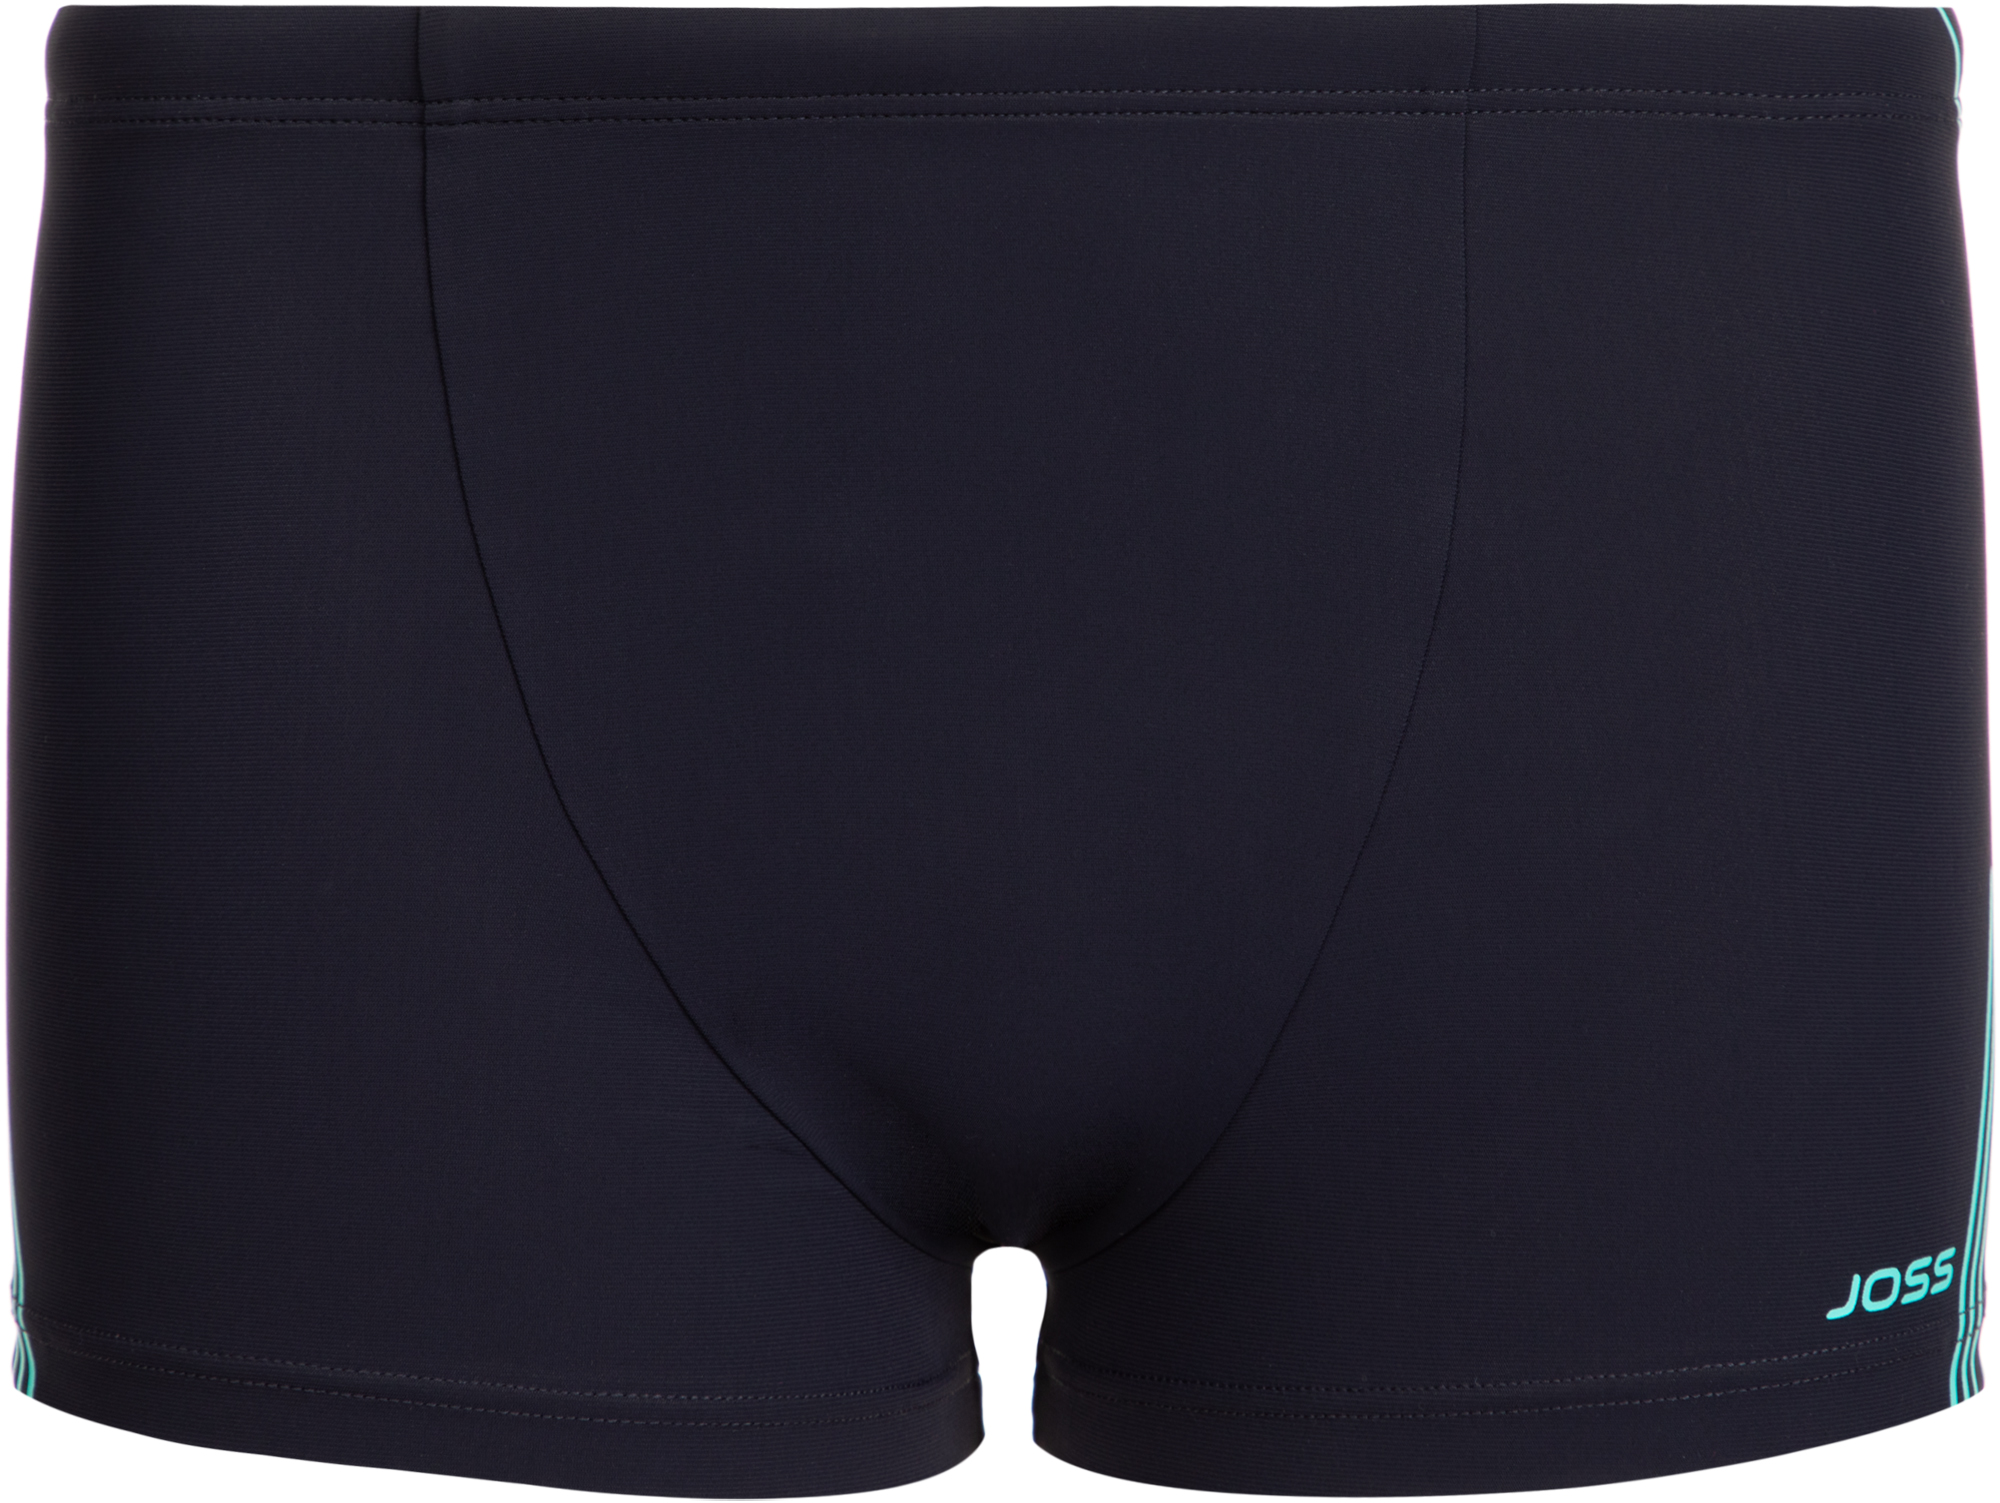 Joss Плавки-шорты для мальчиков Joss, размер 164 плавки для мальчика joss boys swim trunks цвет синий blx05s6 mm размер 164